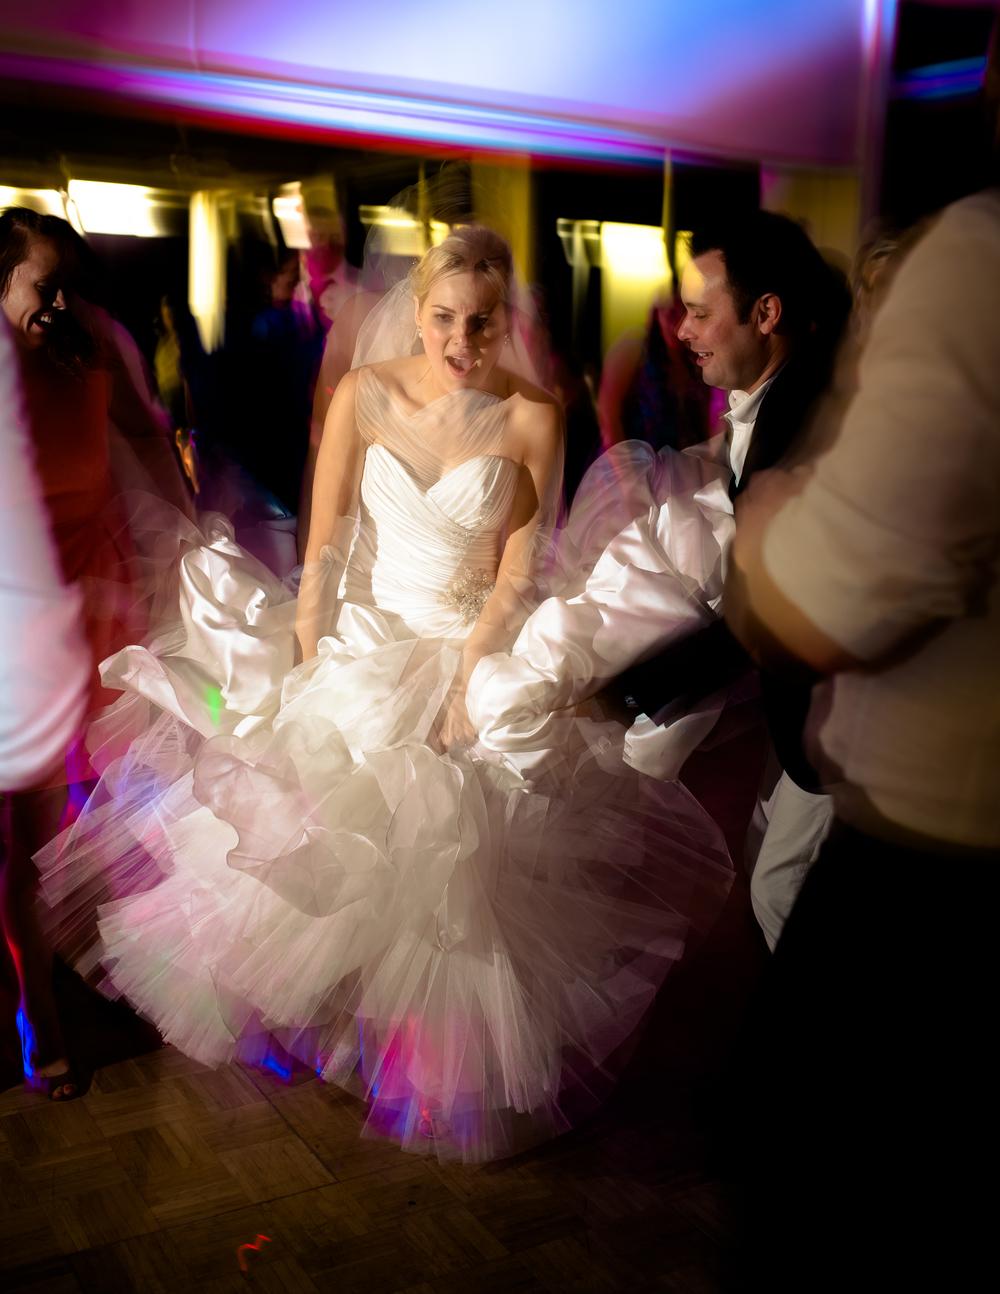 Love love L O V E a little bit of shutter drag action when things start to heat up on the dance floor!!